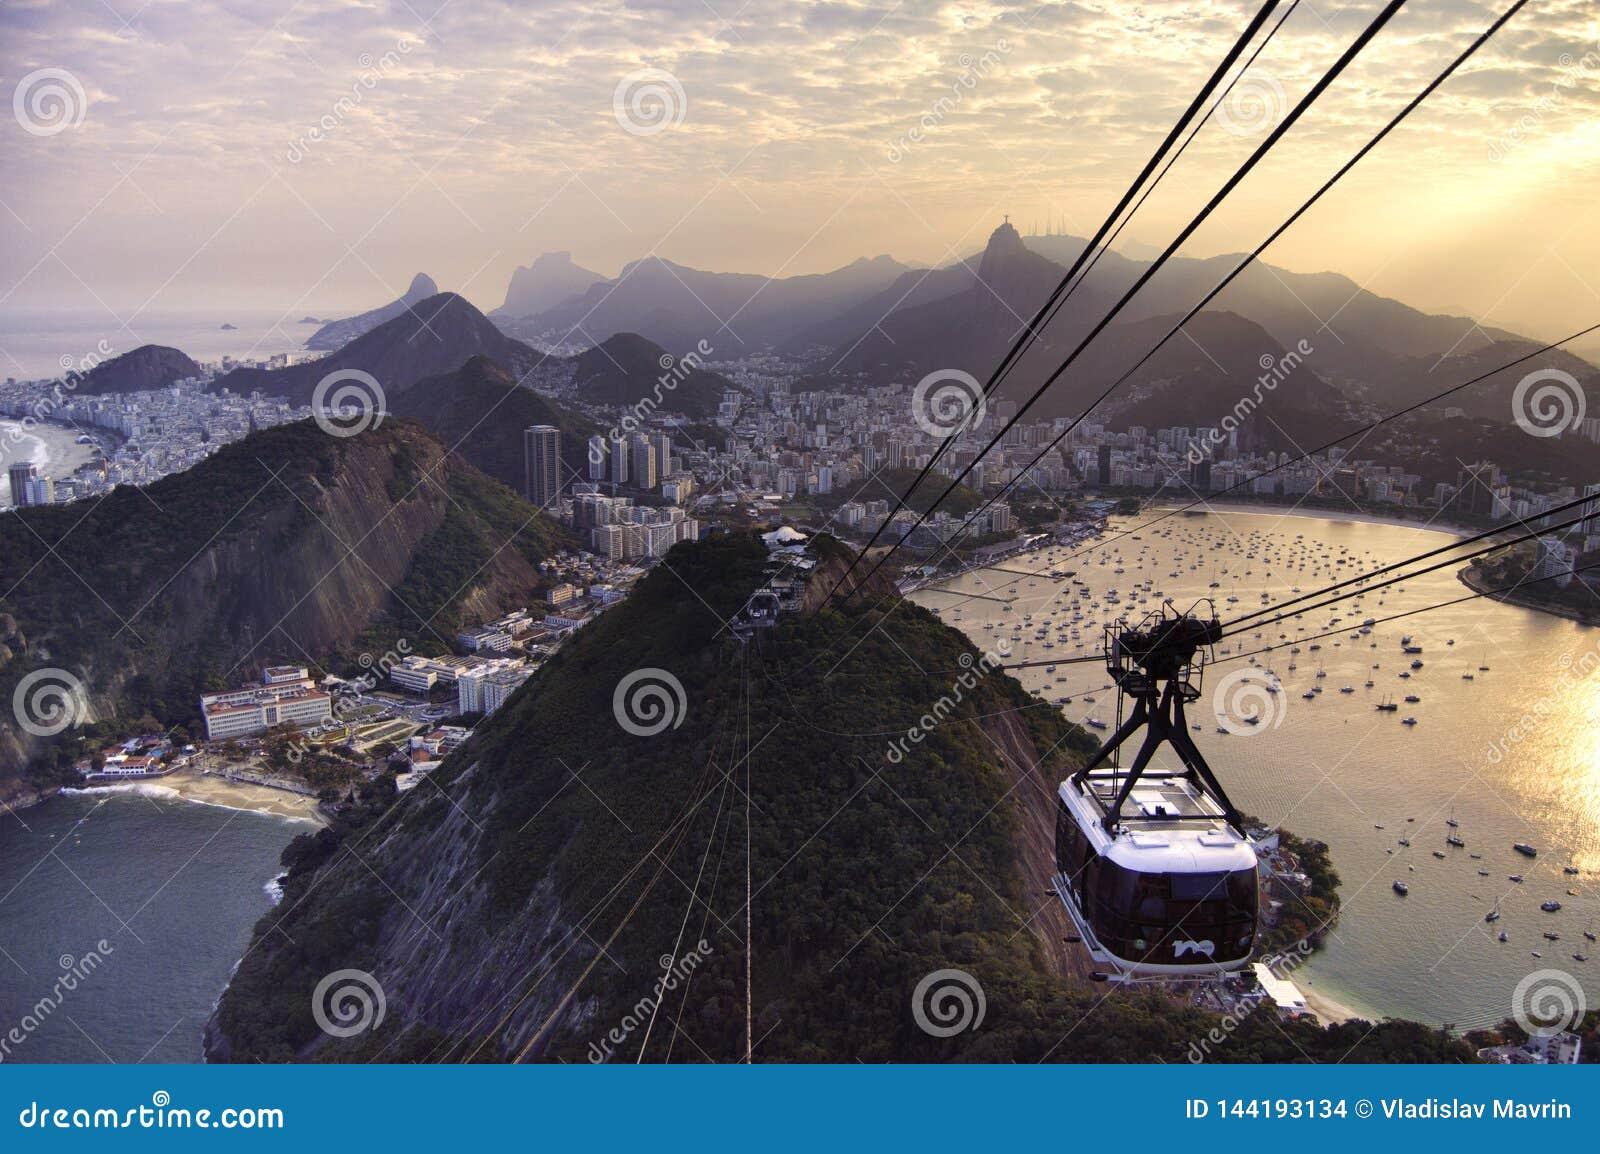 Sugarloaf Cable Car at sunset